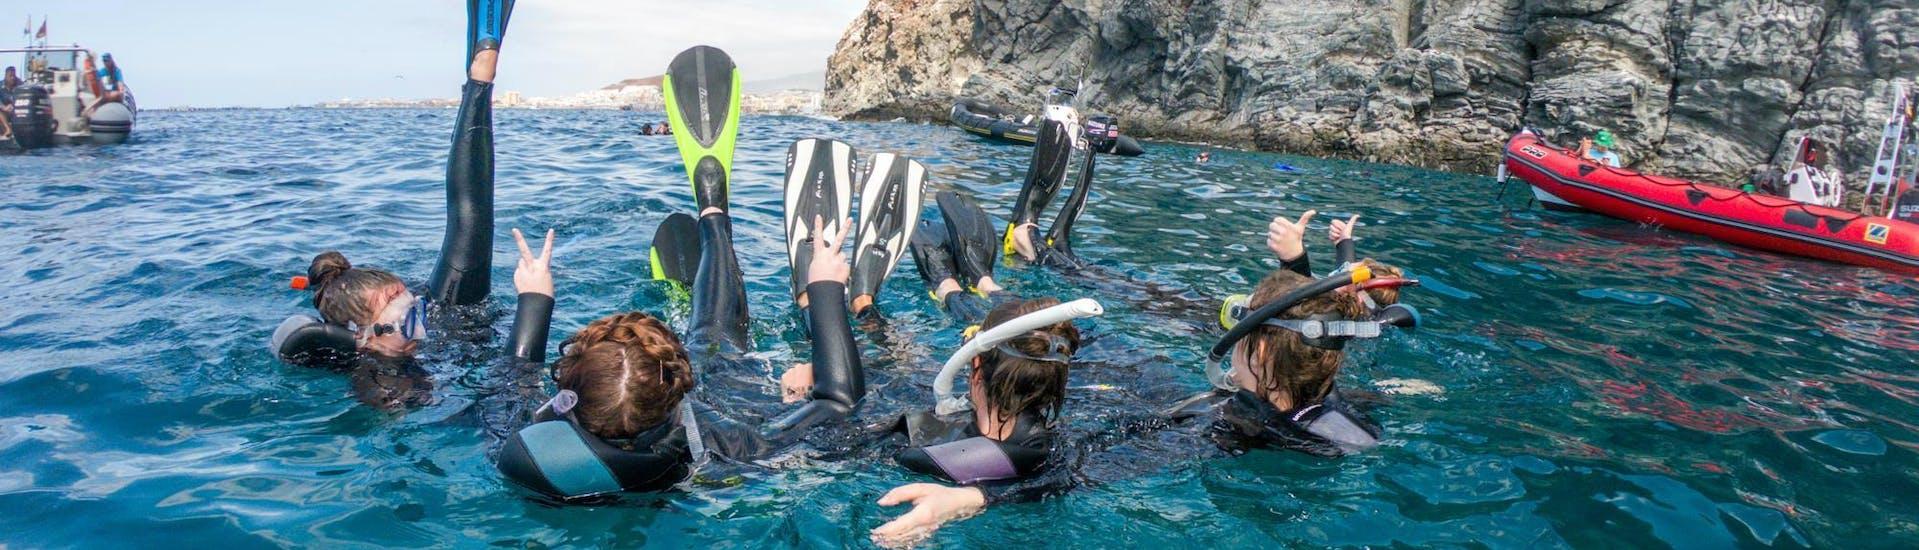 snorkeling-excursion-in-tenerife-aqua-marina-dive-tenerife-hero